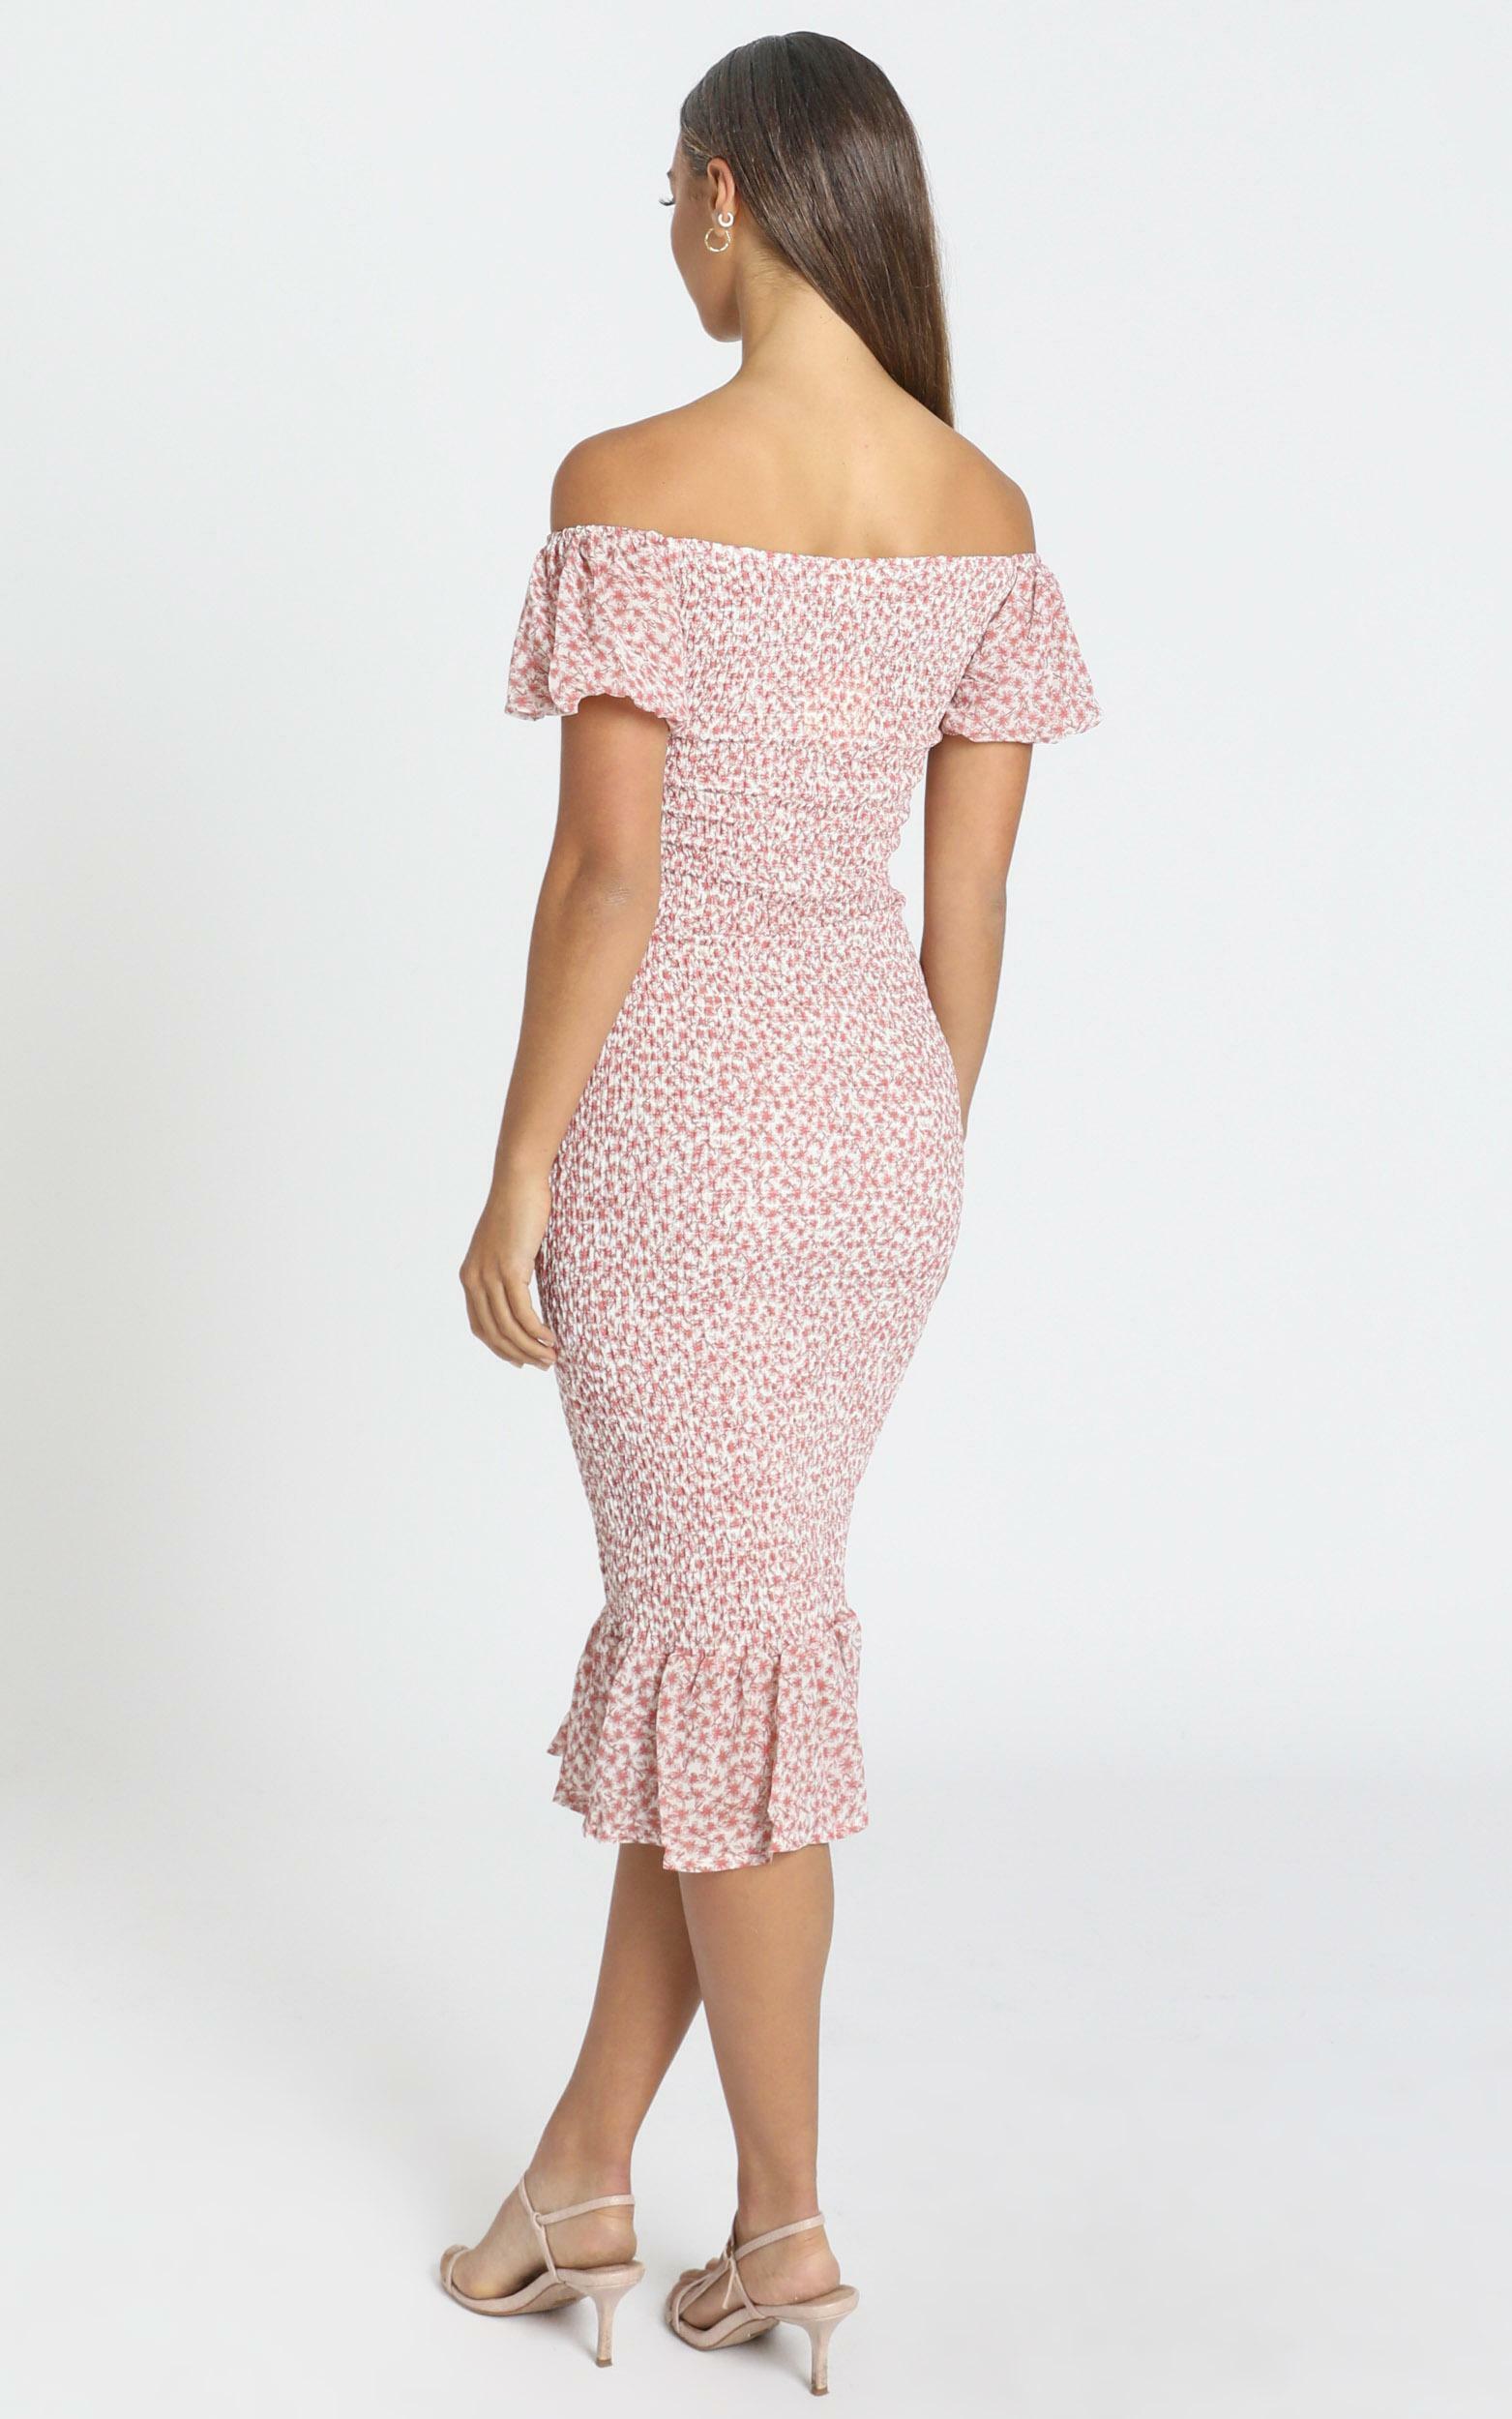 Daphne Dress in Pink Floral - 6 (XS), Pink, hi-res image number null